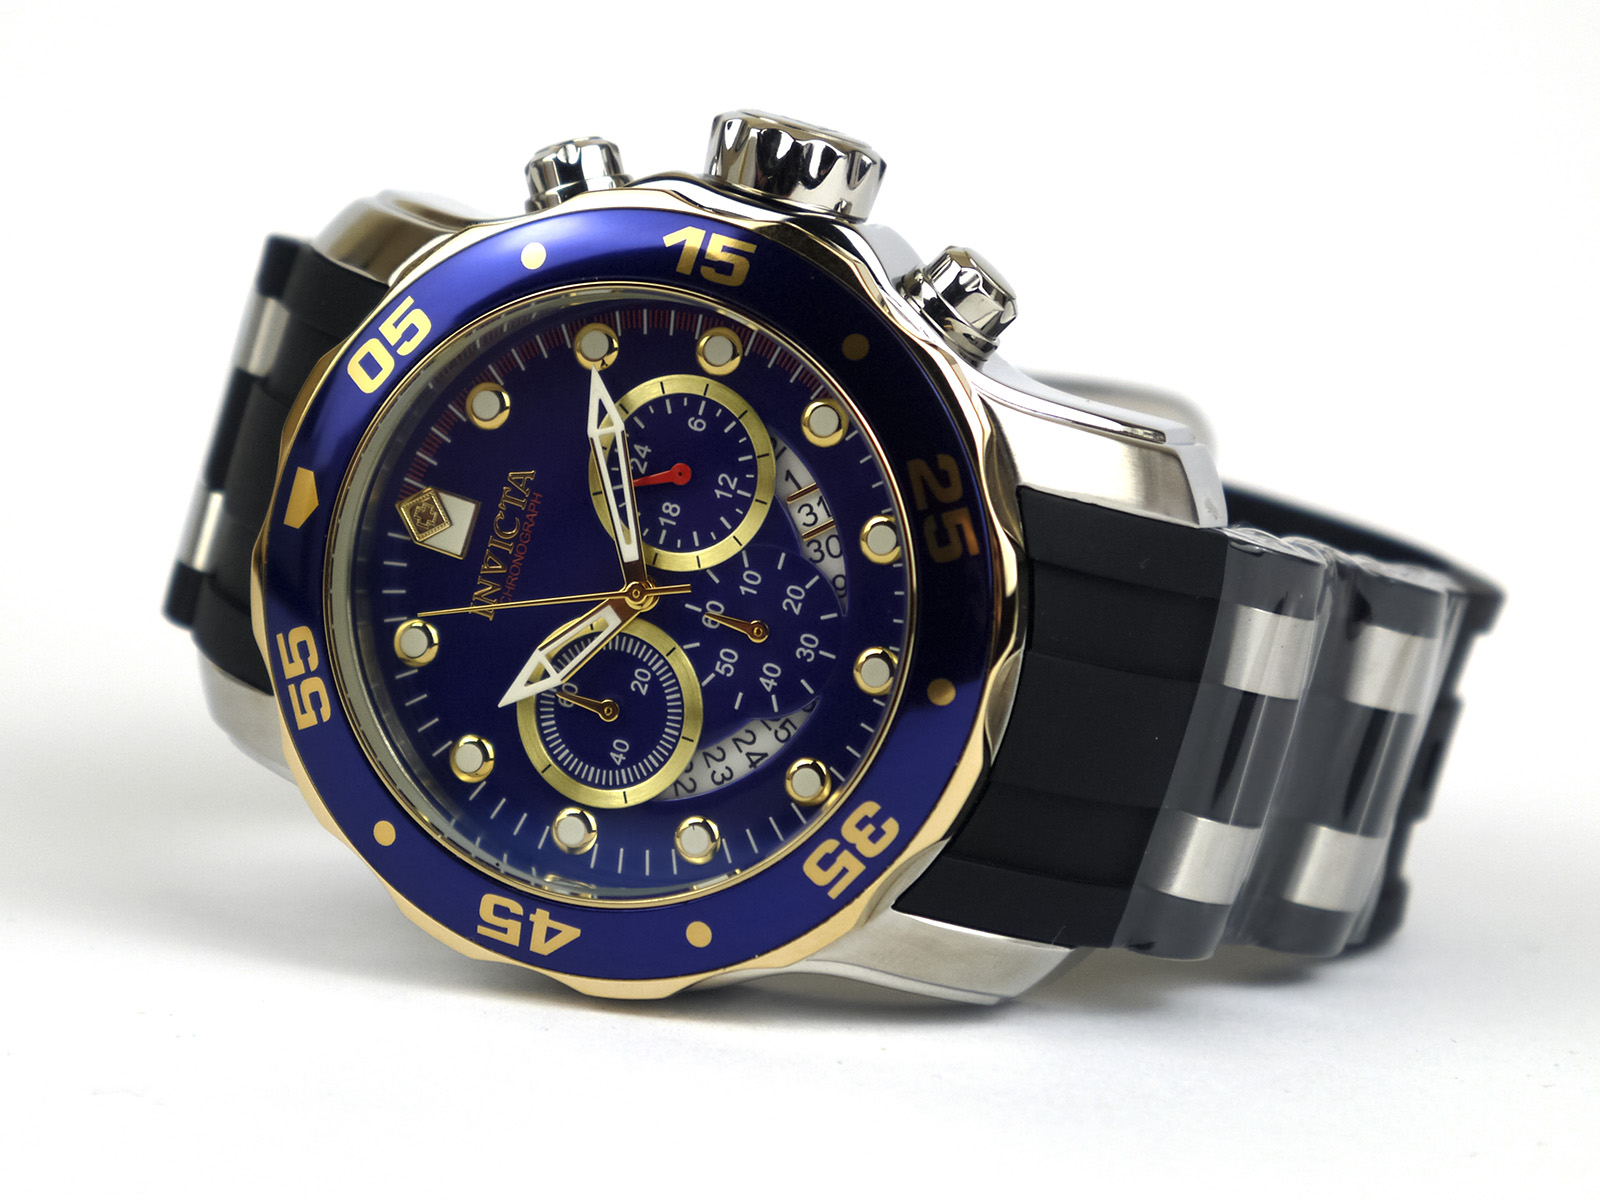 Invicta 22971 Pro Diver Chronograph Blue Dial Steel-Rubber Watch